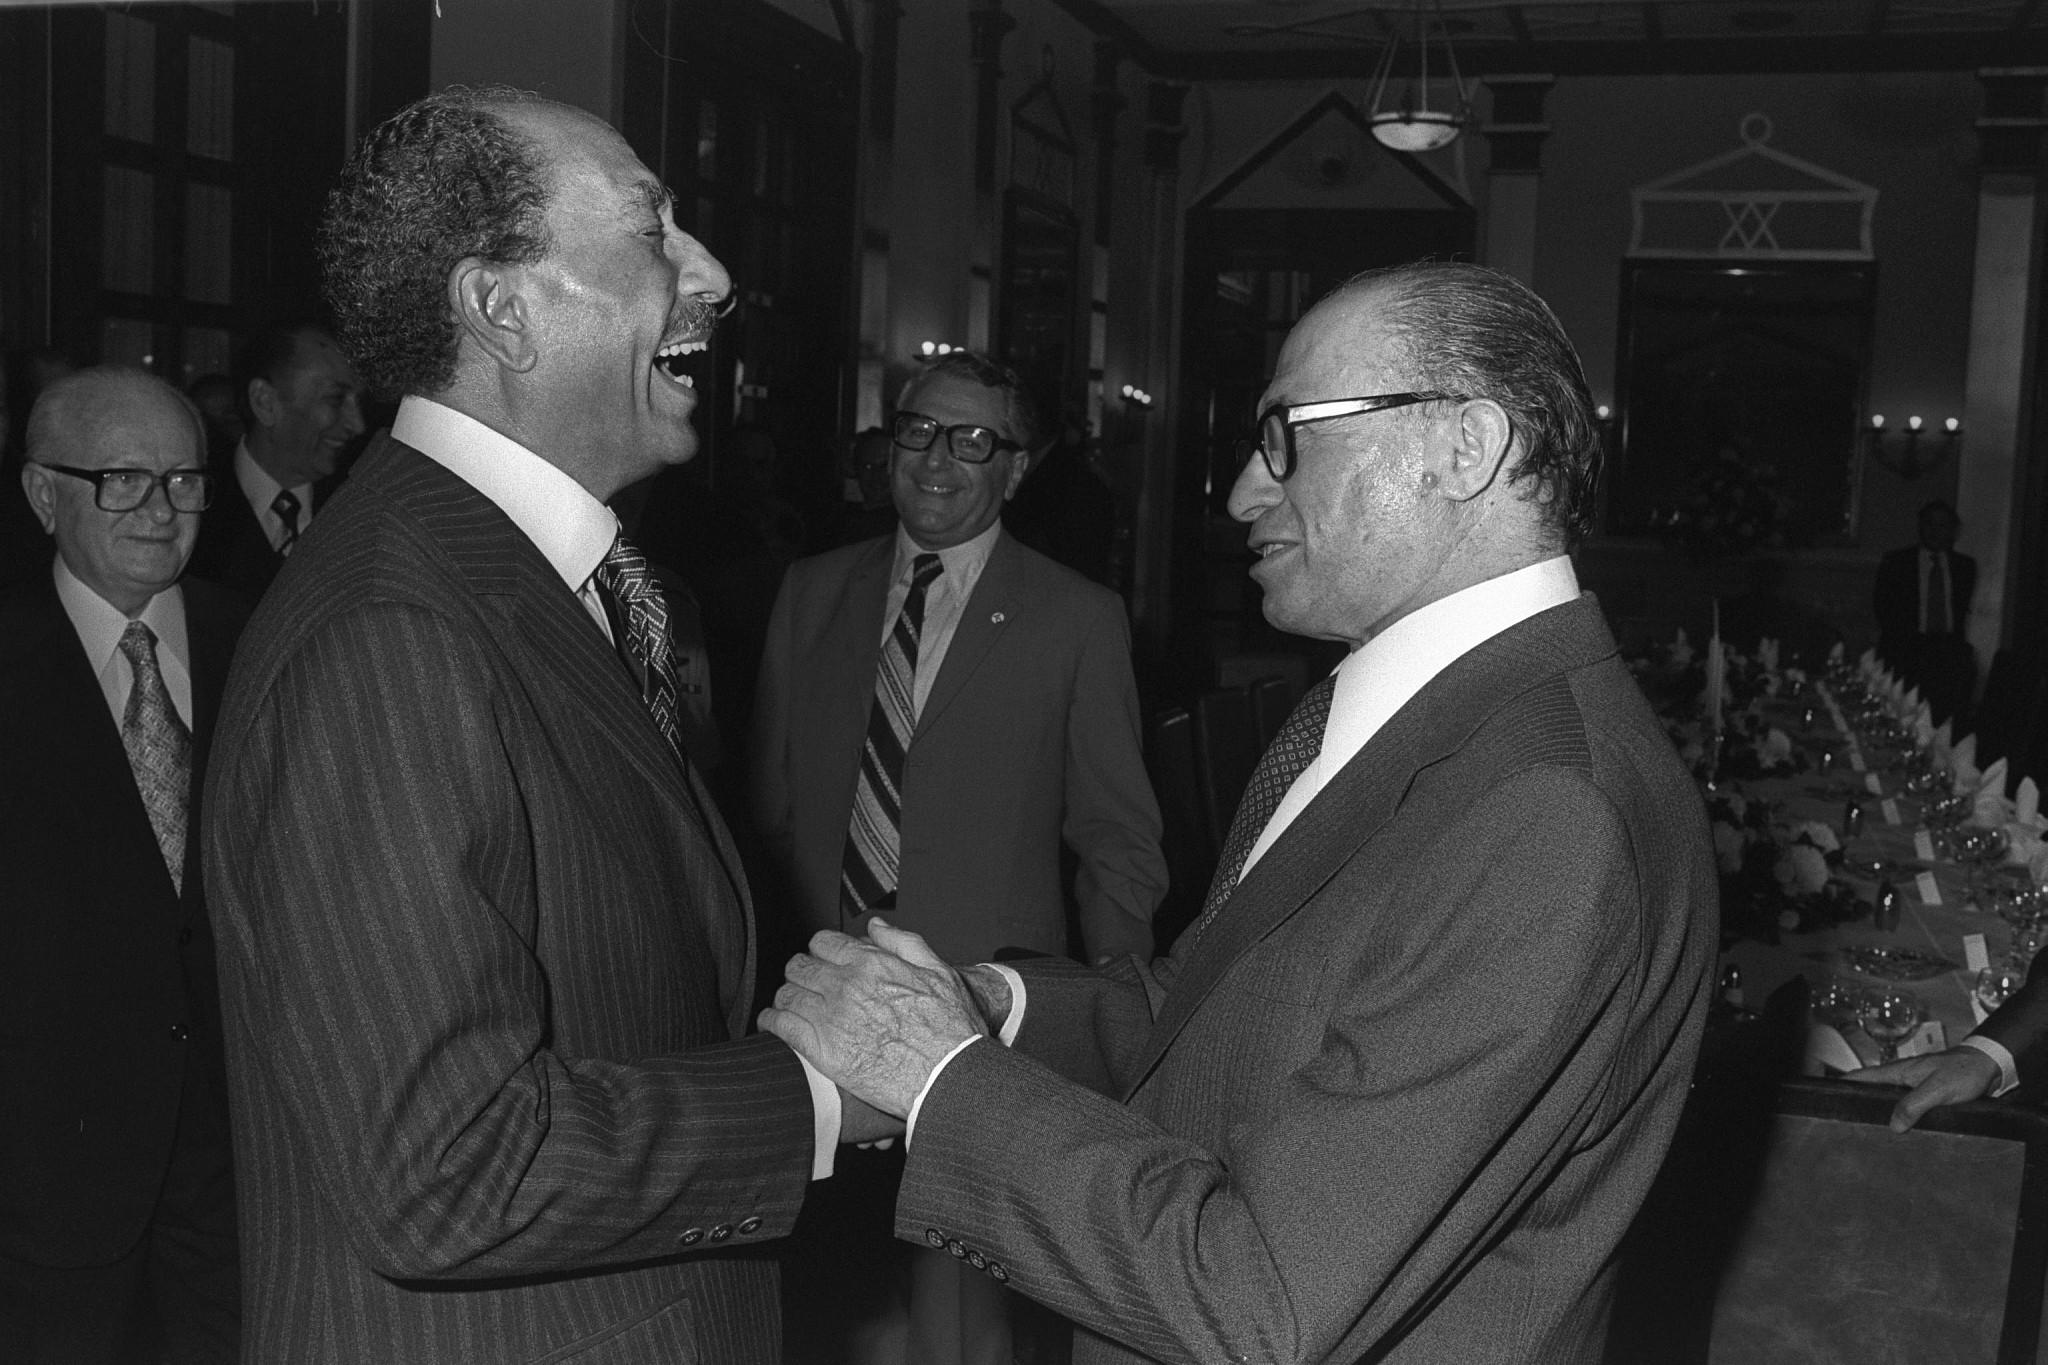 Trump signs law conferring Congressional Gold Medal on Anwar Sadat